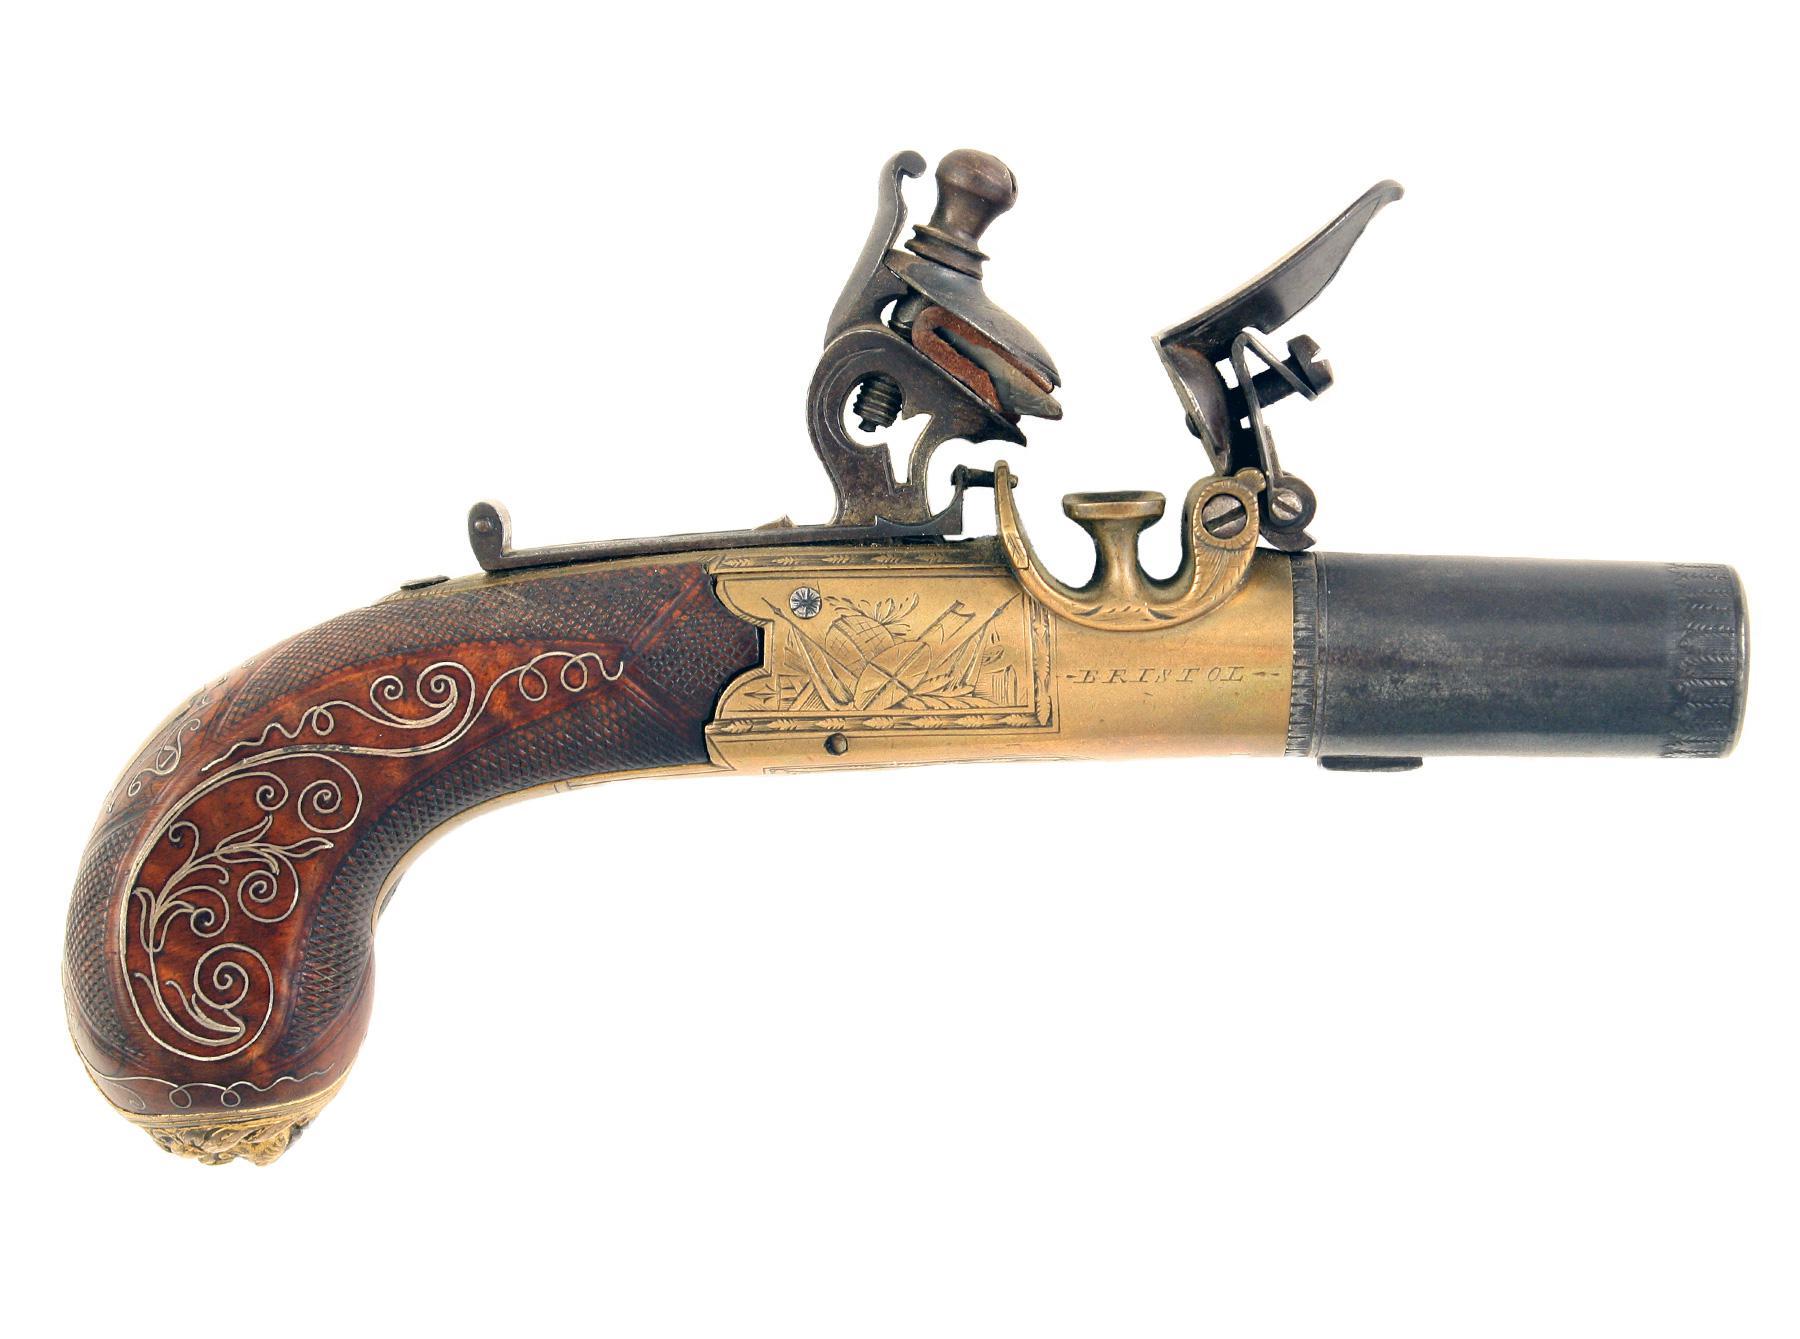 A Beautiful Brass Framed Flintlock Pocket Pistol